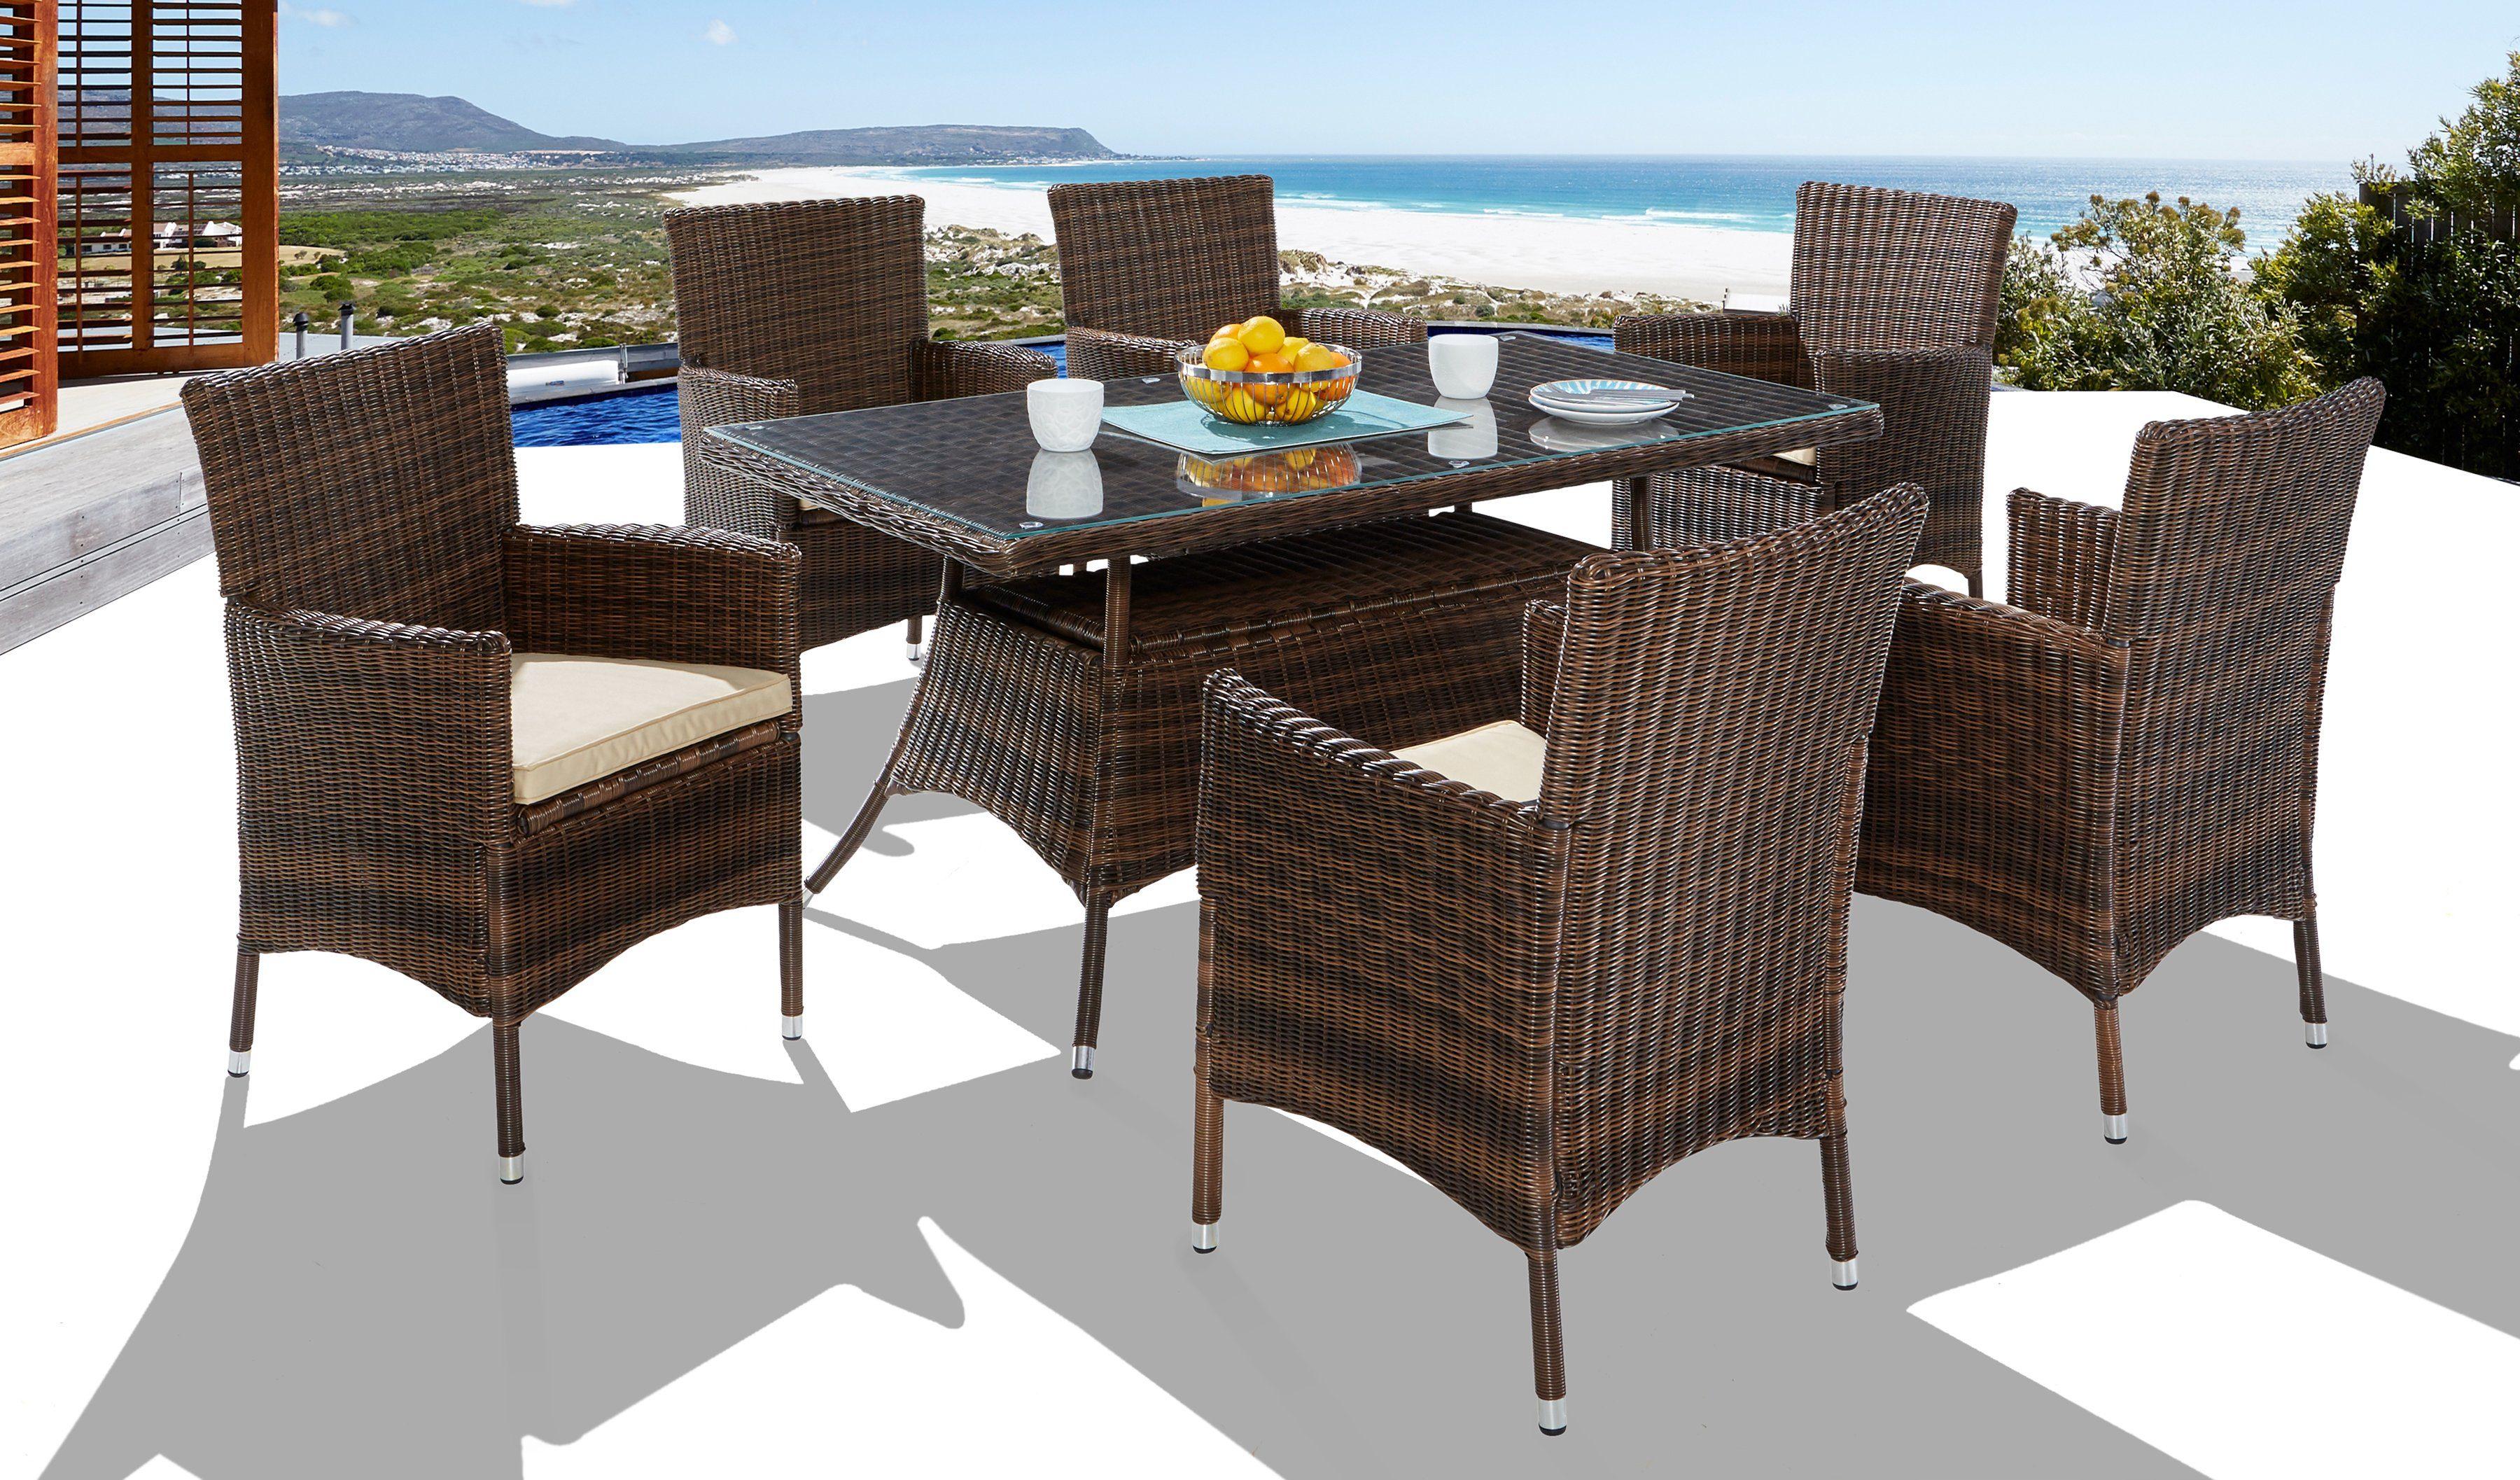 13-tgl. Gartenmöbelset »Santiago«, 6 Sessel, Tisch 150x80 cm, Polyrattan, braun